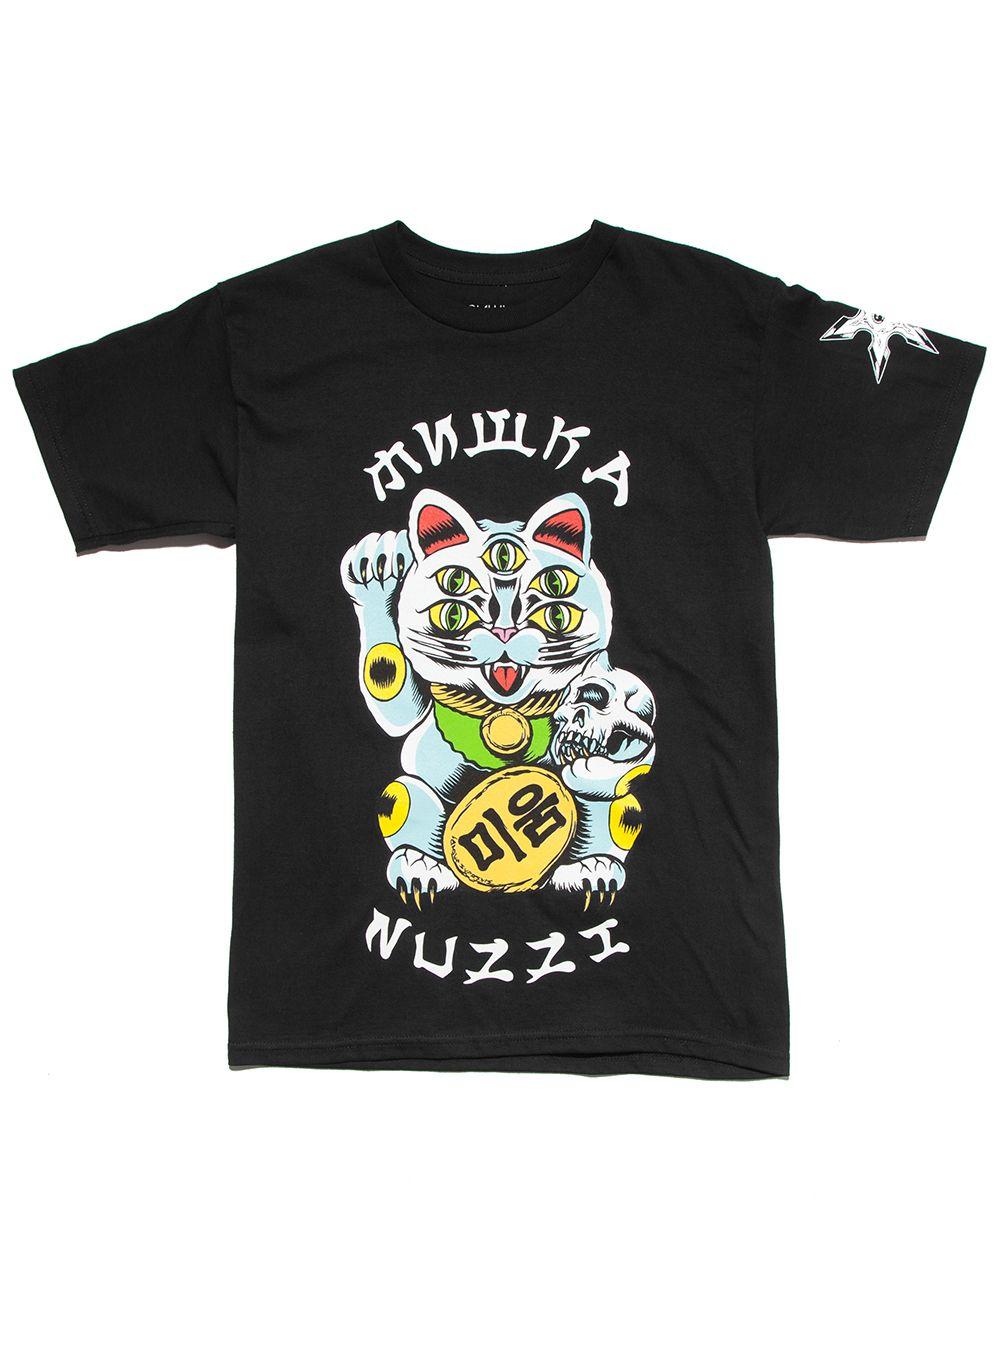 Spencer Nuzzi: Luck's Run Out T-Shirt (Black)